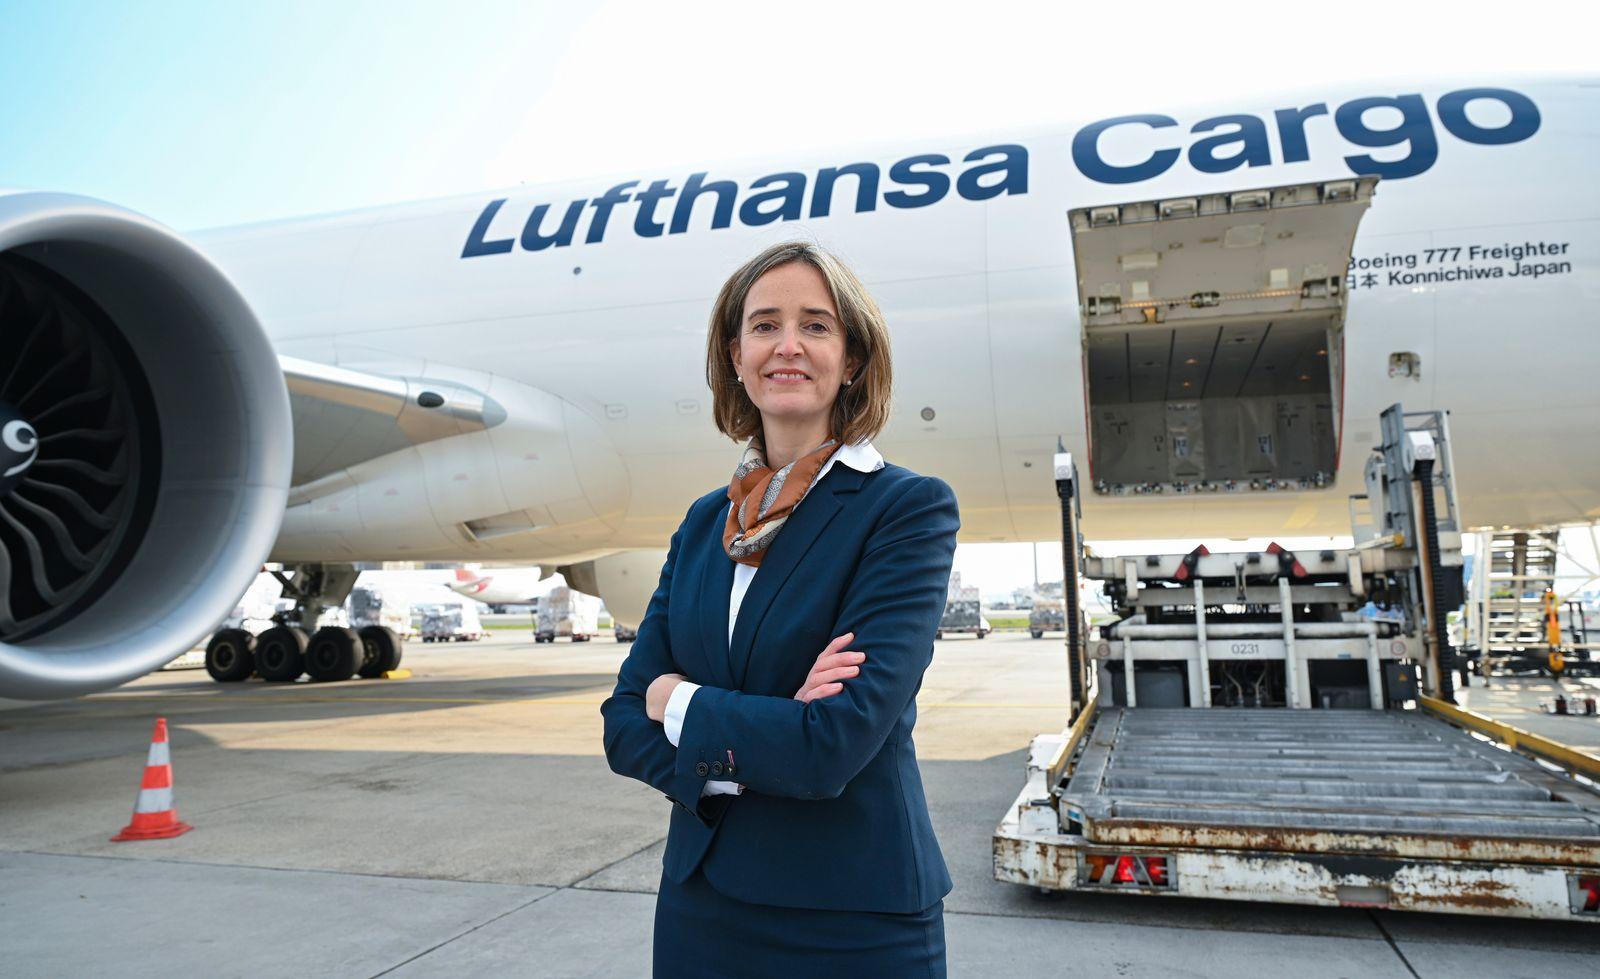 Lufthansa Cargo AG - Dorothea von Boxberg